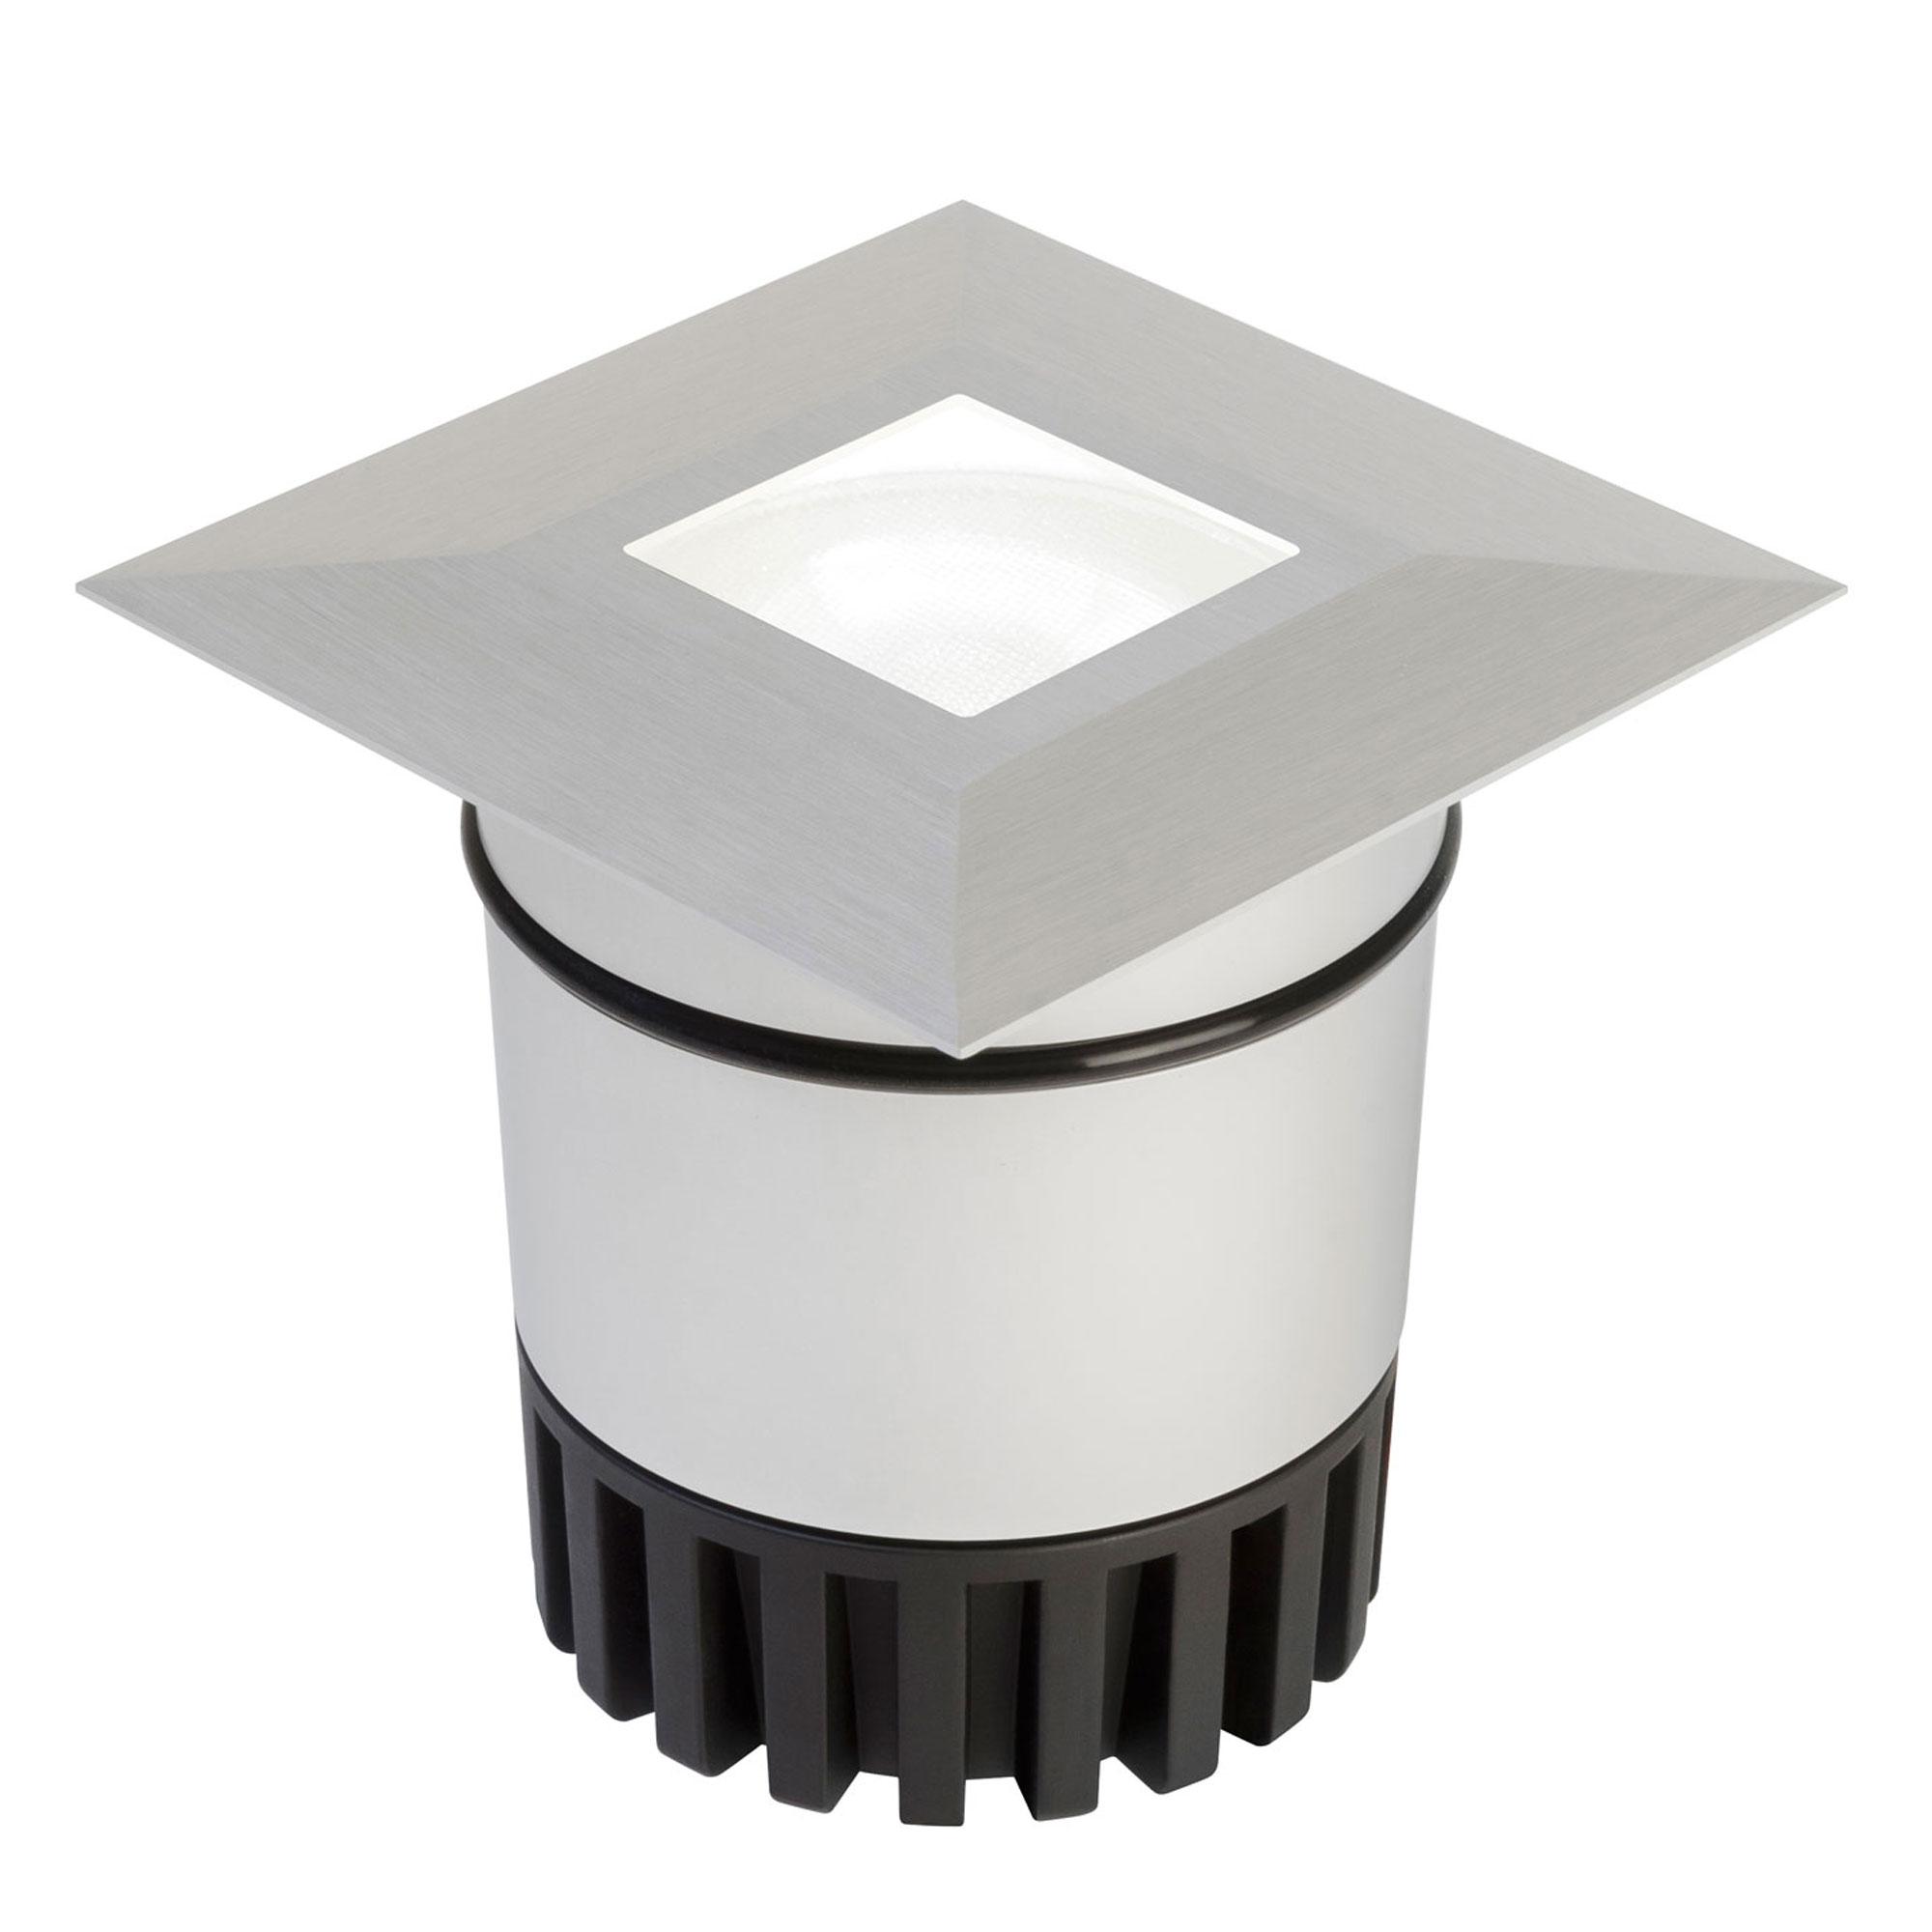 Sun3 Square LED 36Deg Recessed Uplight Steplight By Edge Lighting Sun3 Hdl3